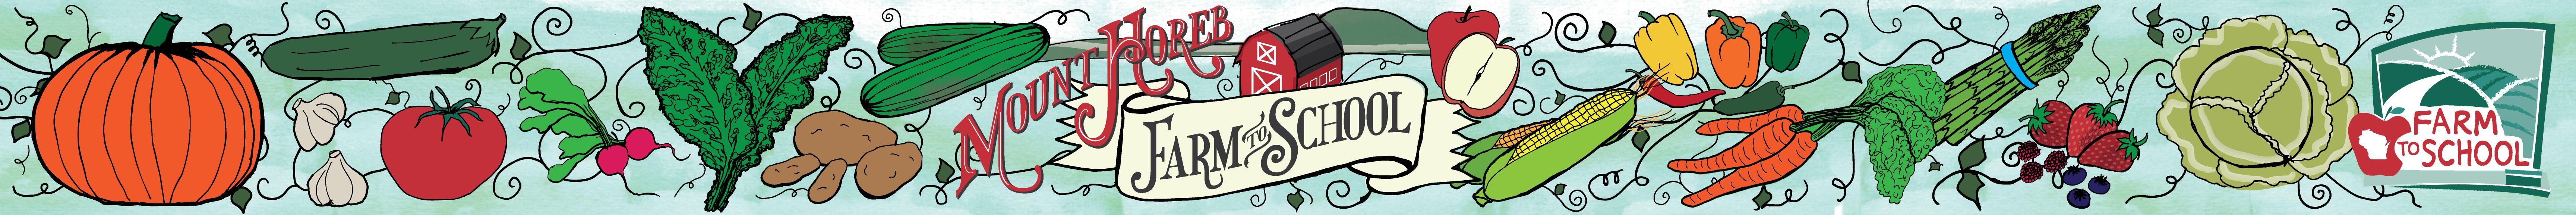 mhfarm2schoolBanner